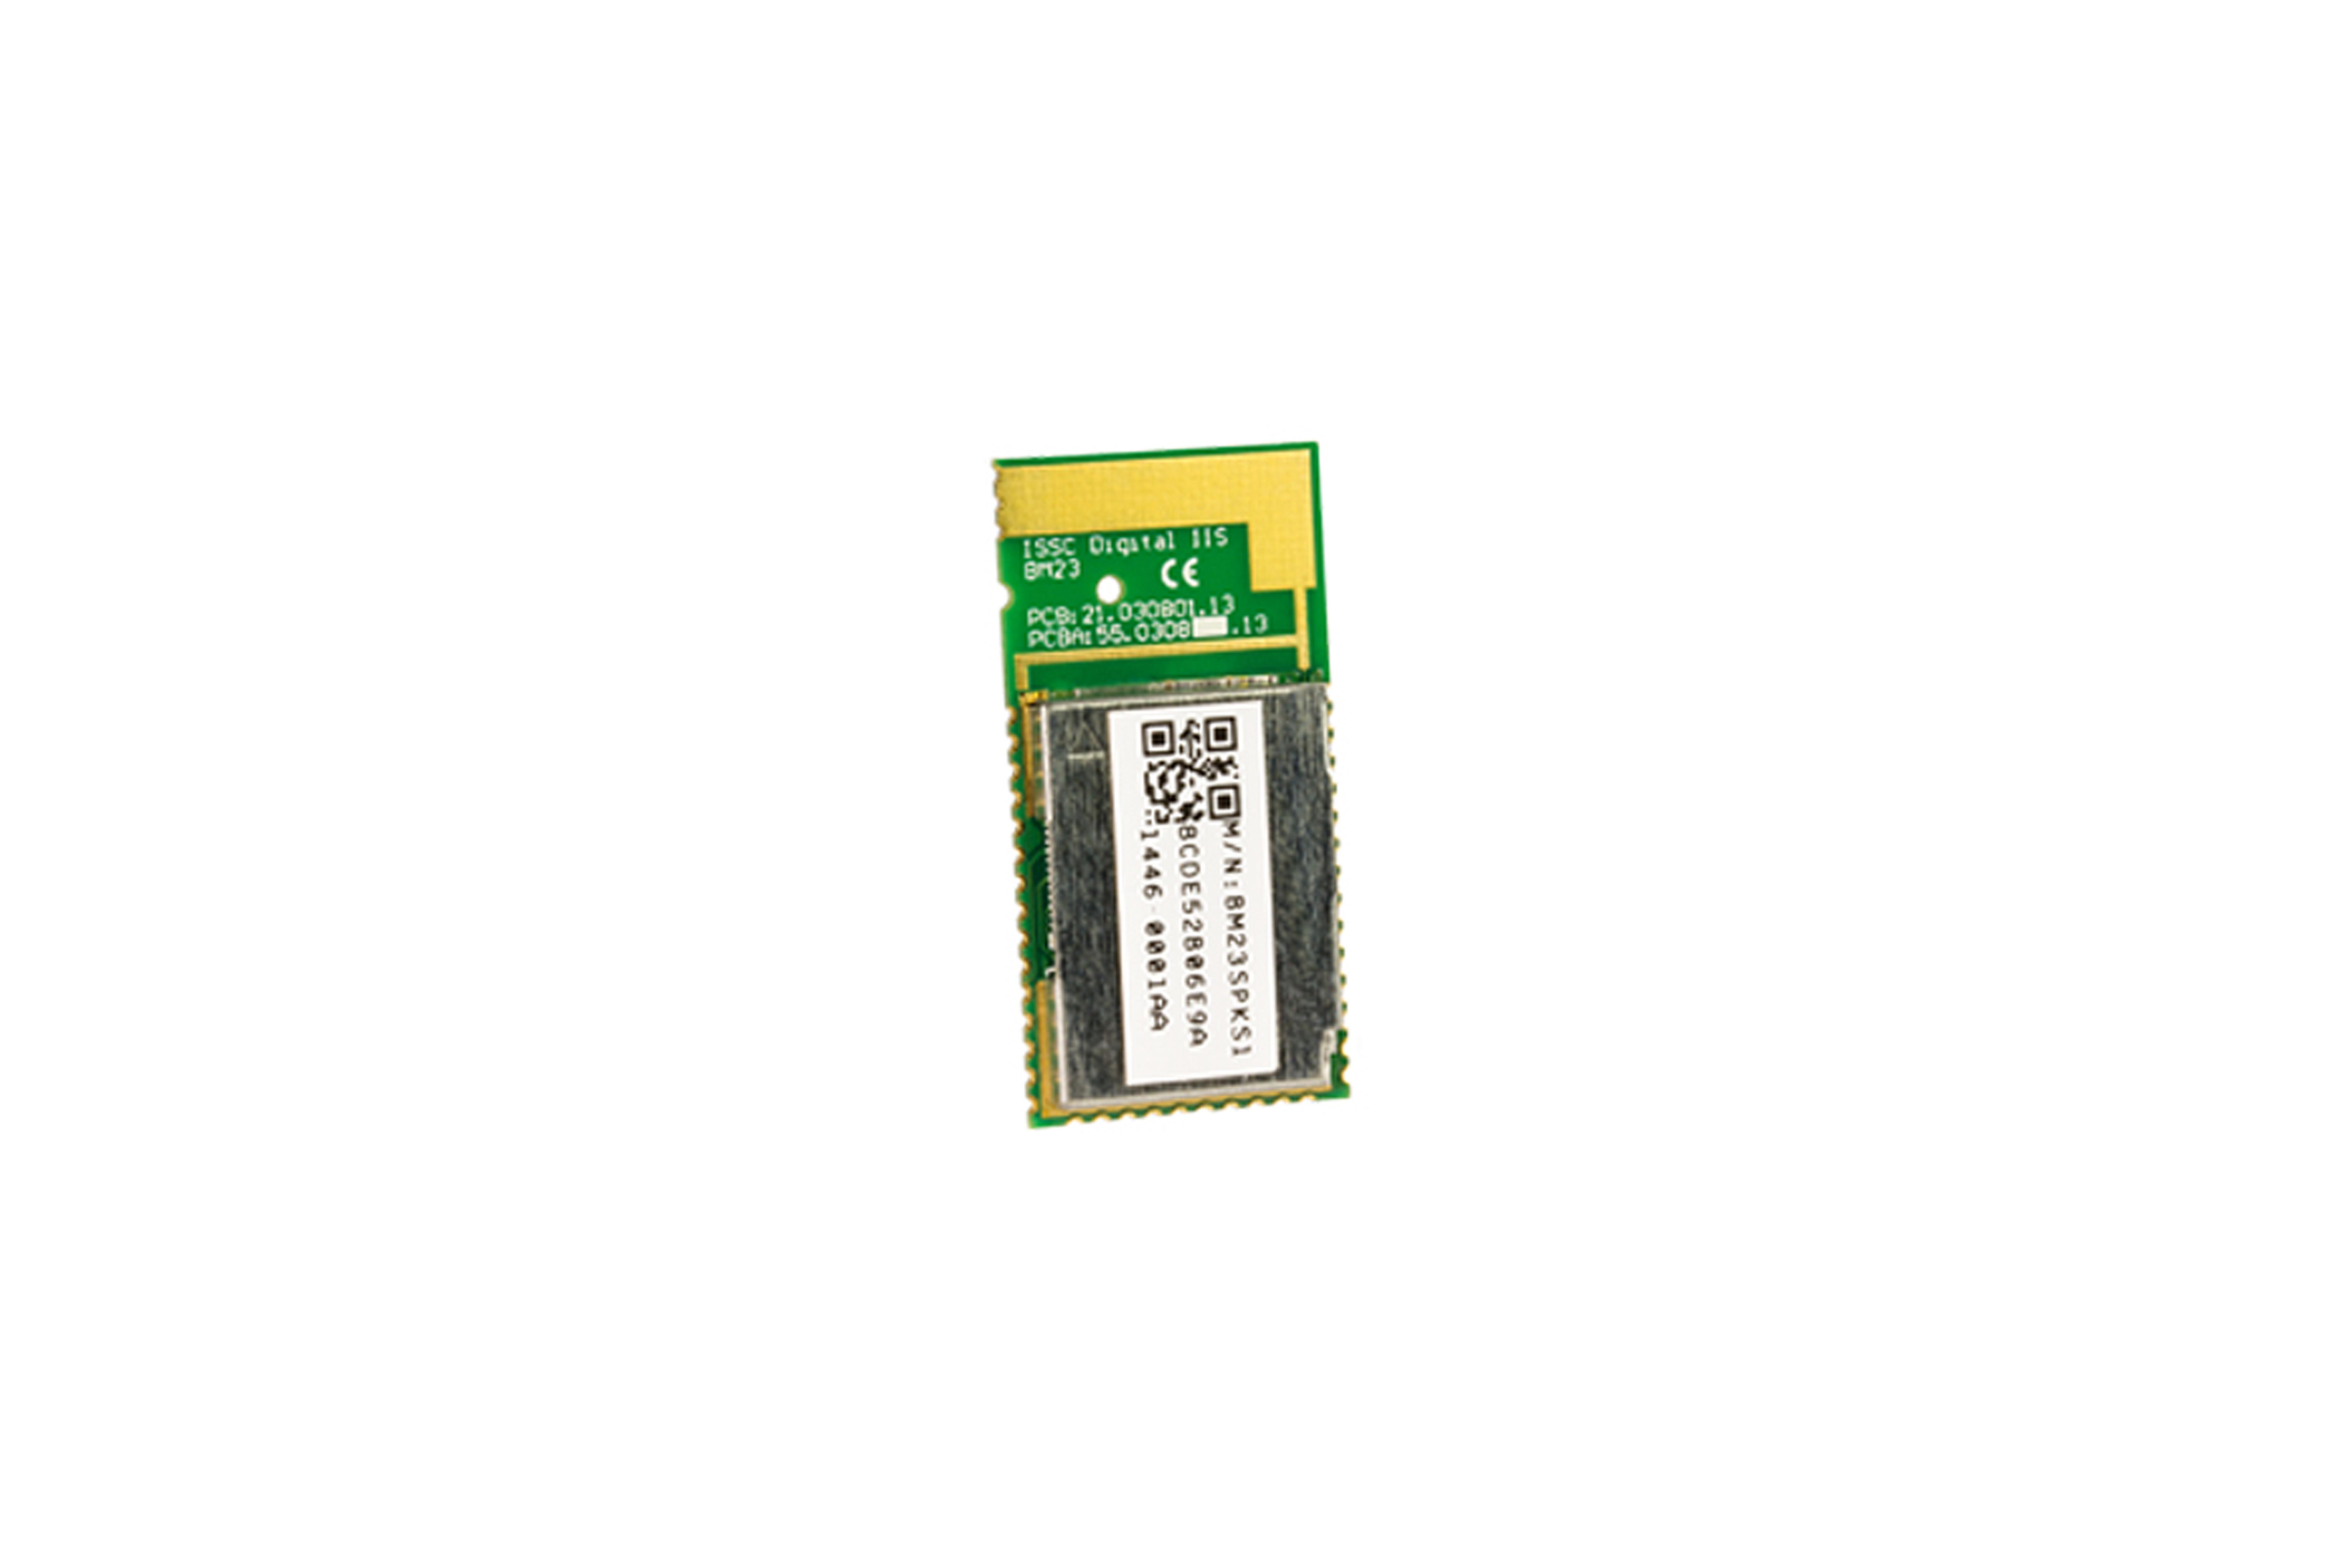 Module Bluetooth 4.1 BDR/EDRclasse 2